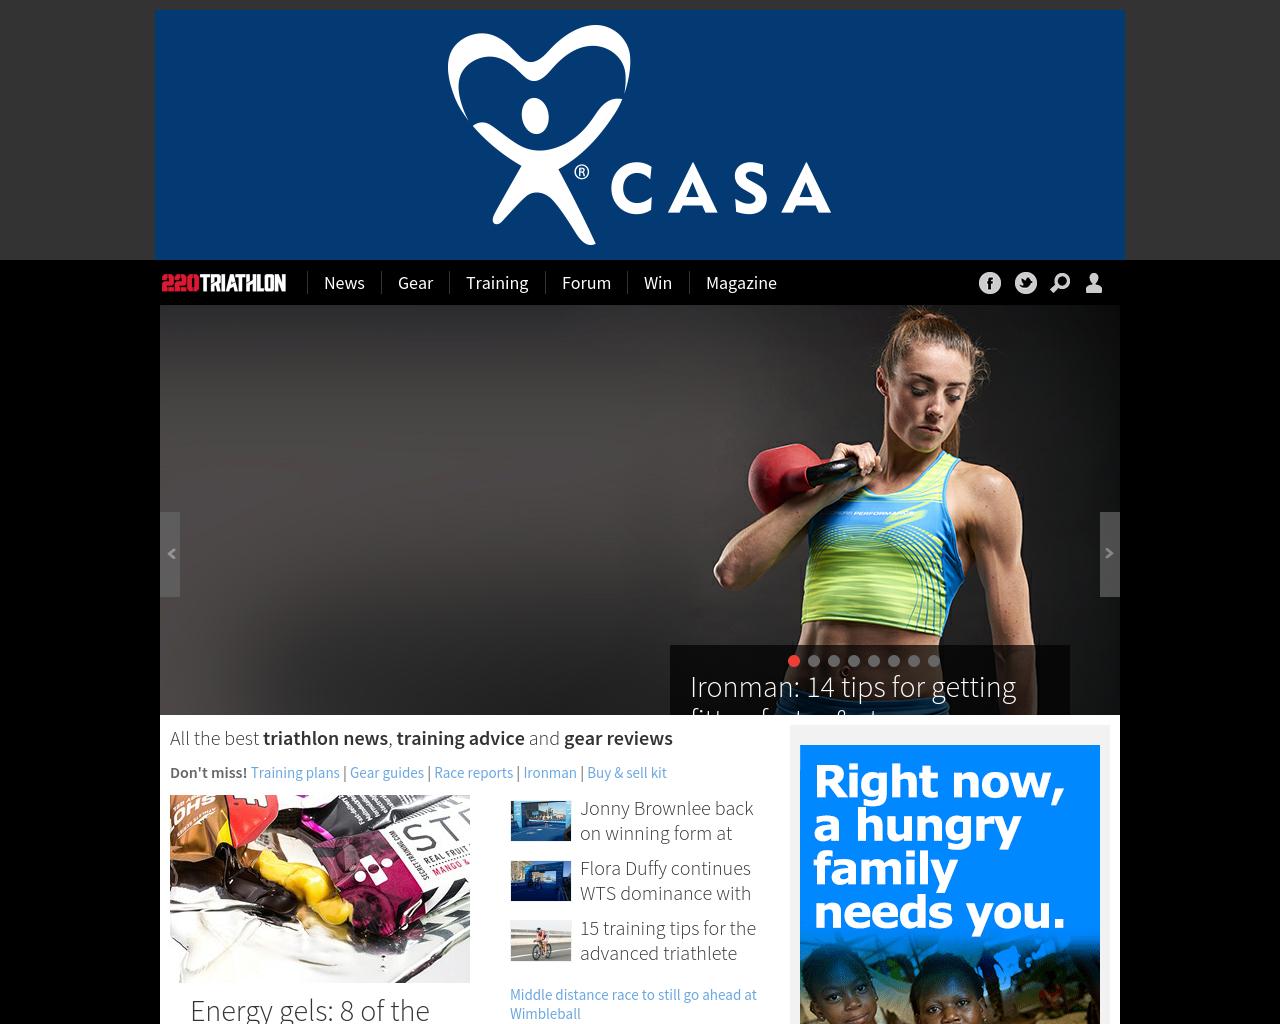 220-Triathlon-Advertising-Reviews-Pricing